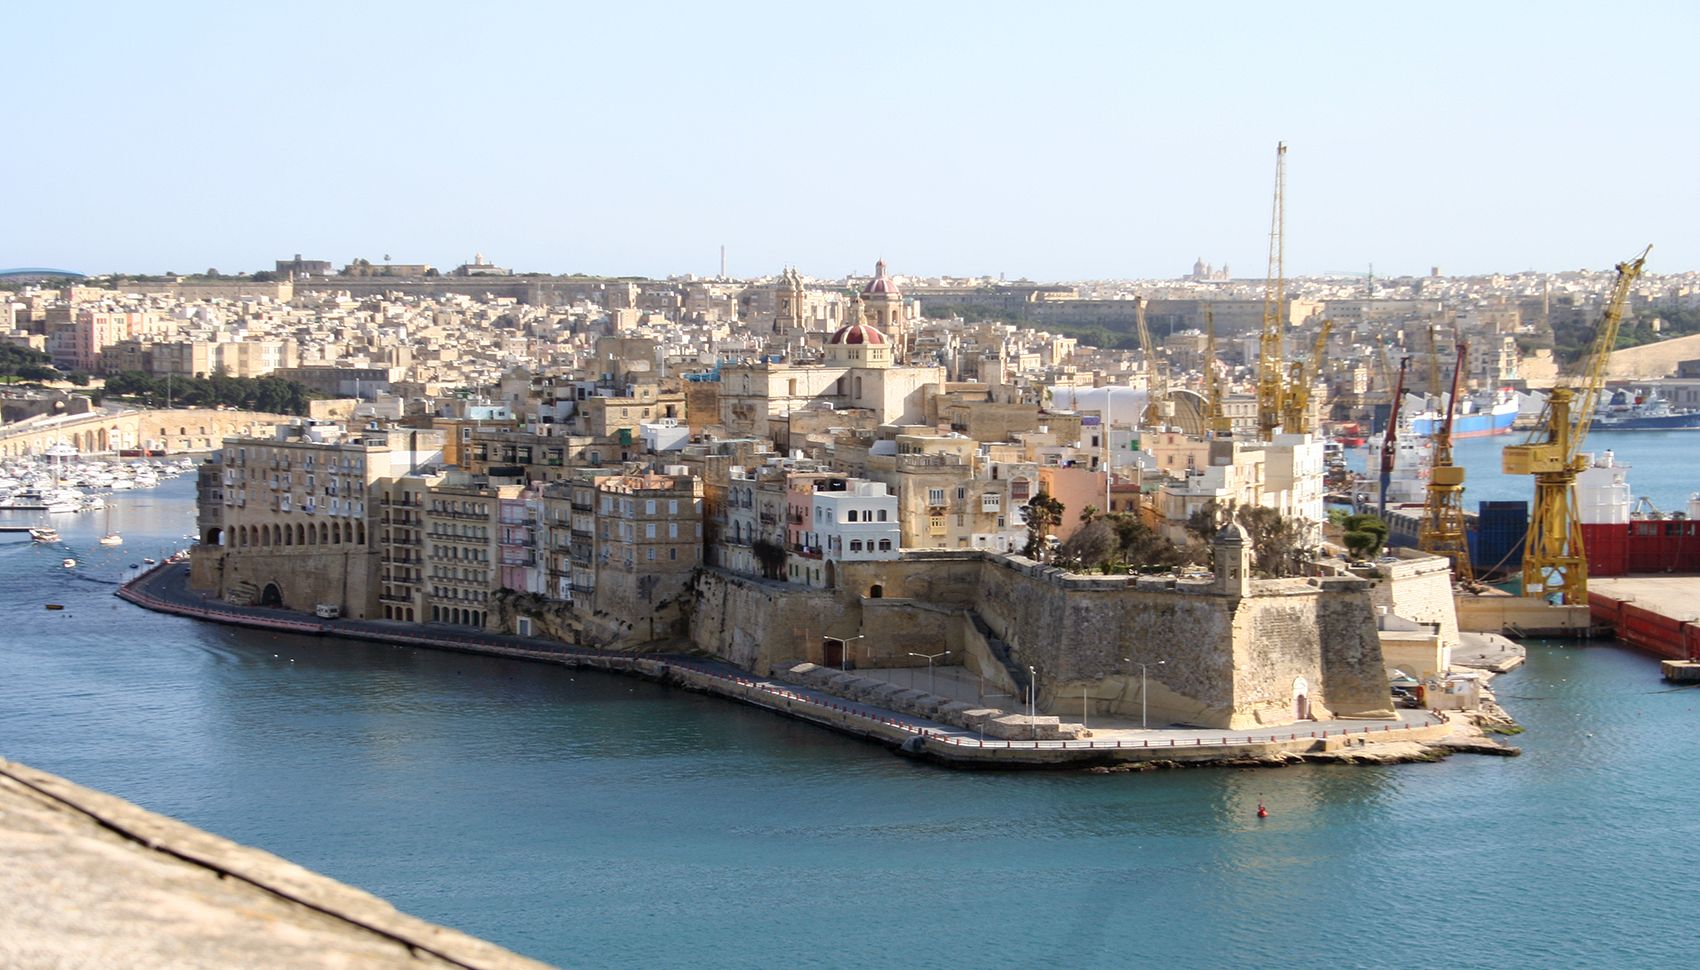 File:Malta-senglea-57.jpg - Wikimedia Commons